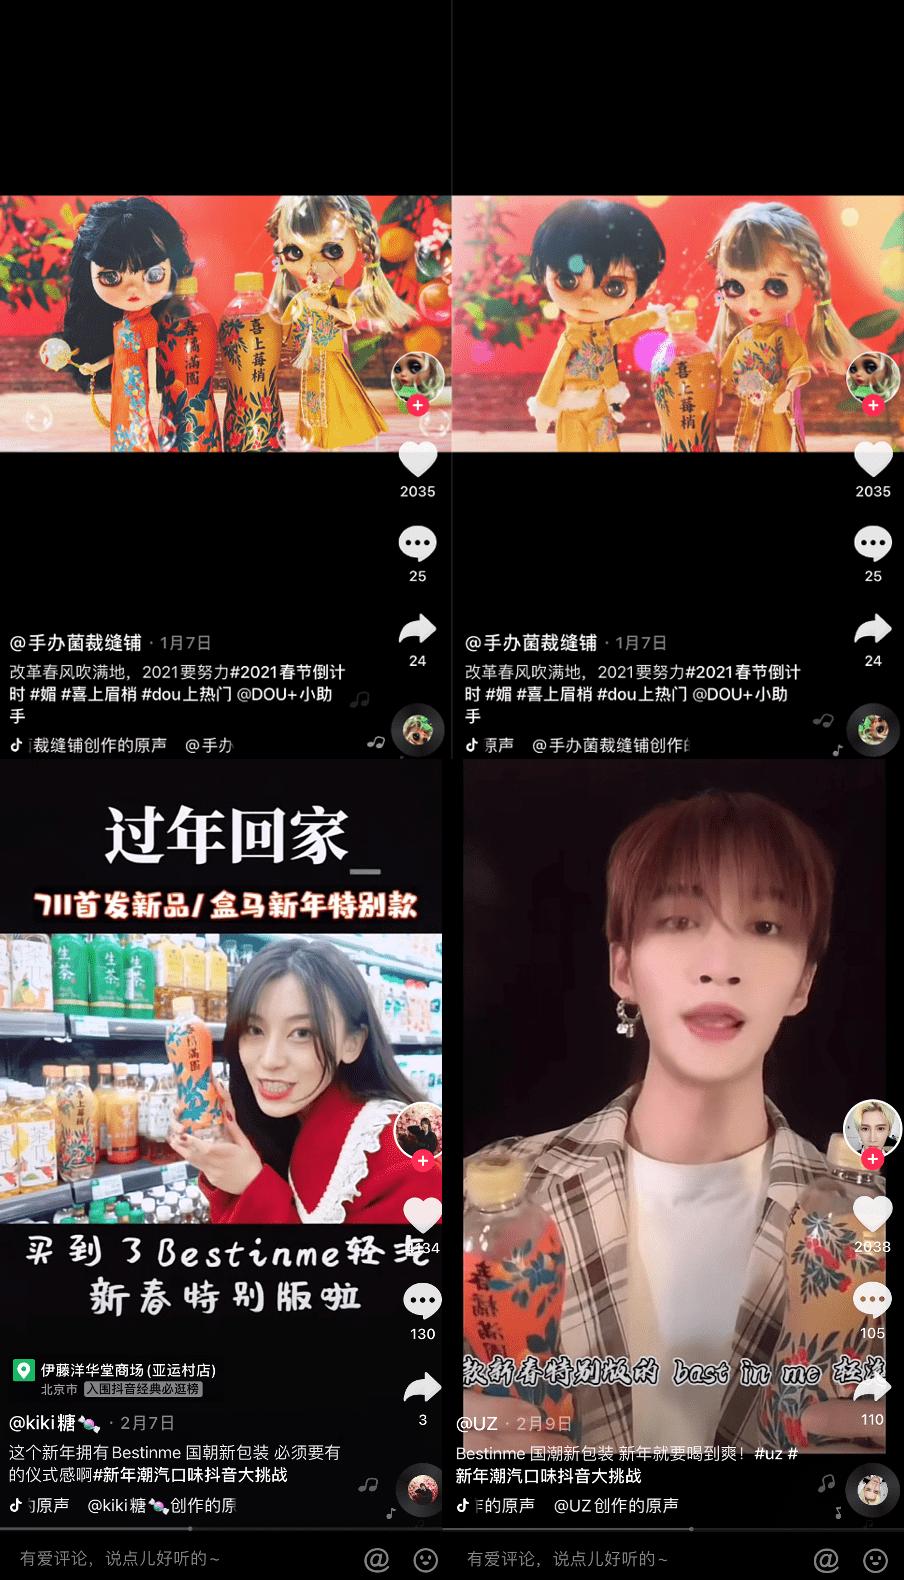 Bestinme喜春系列成新年饮品黑马,首批春节期间上架即售罄